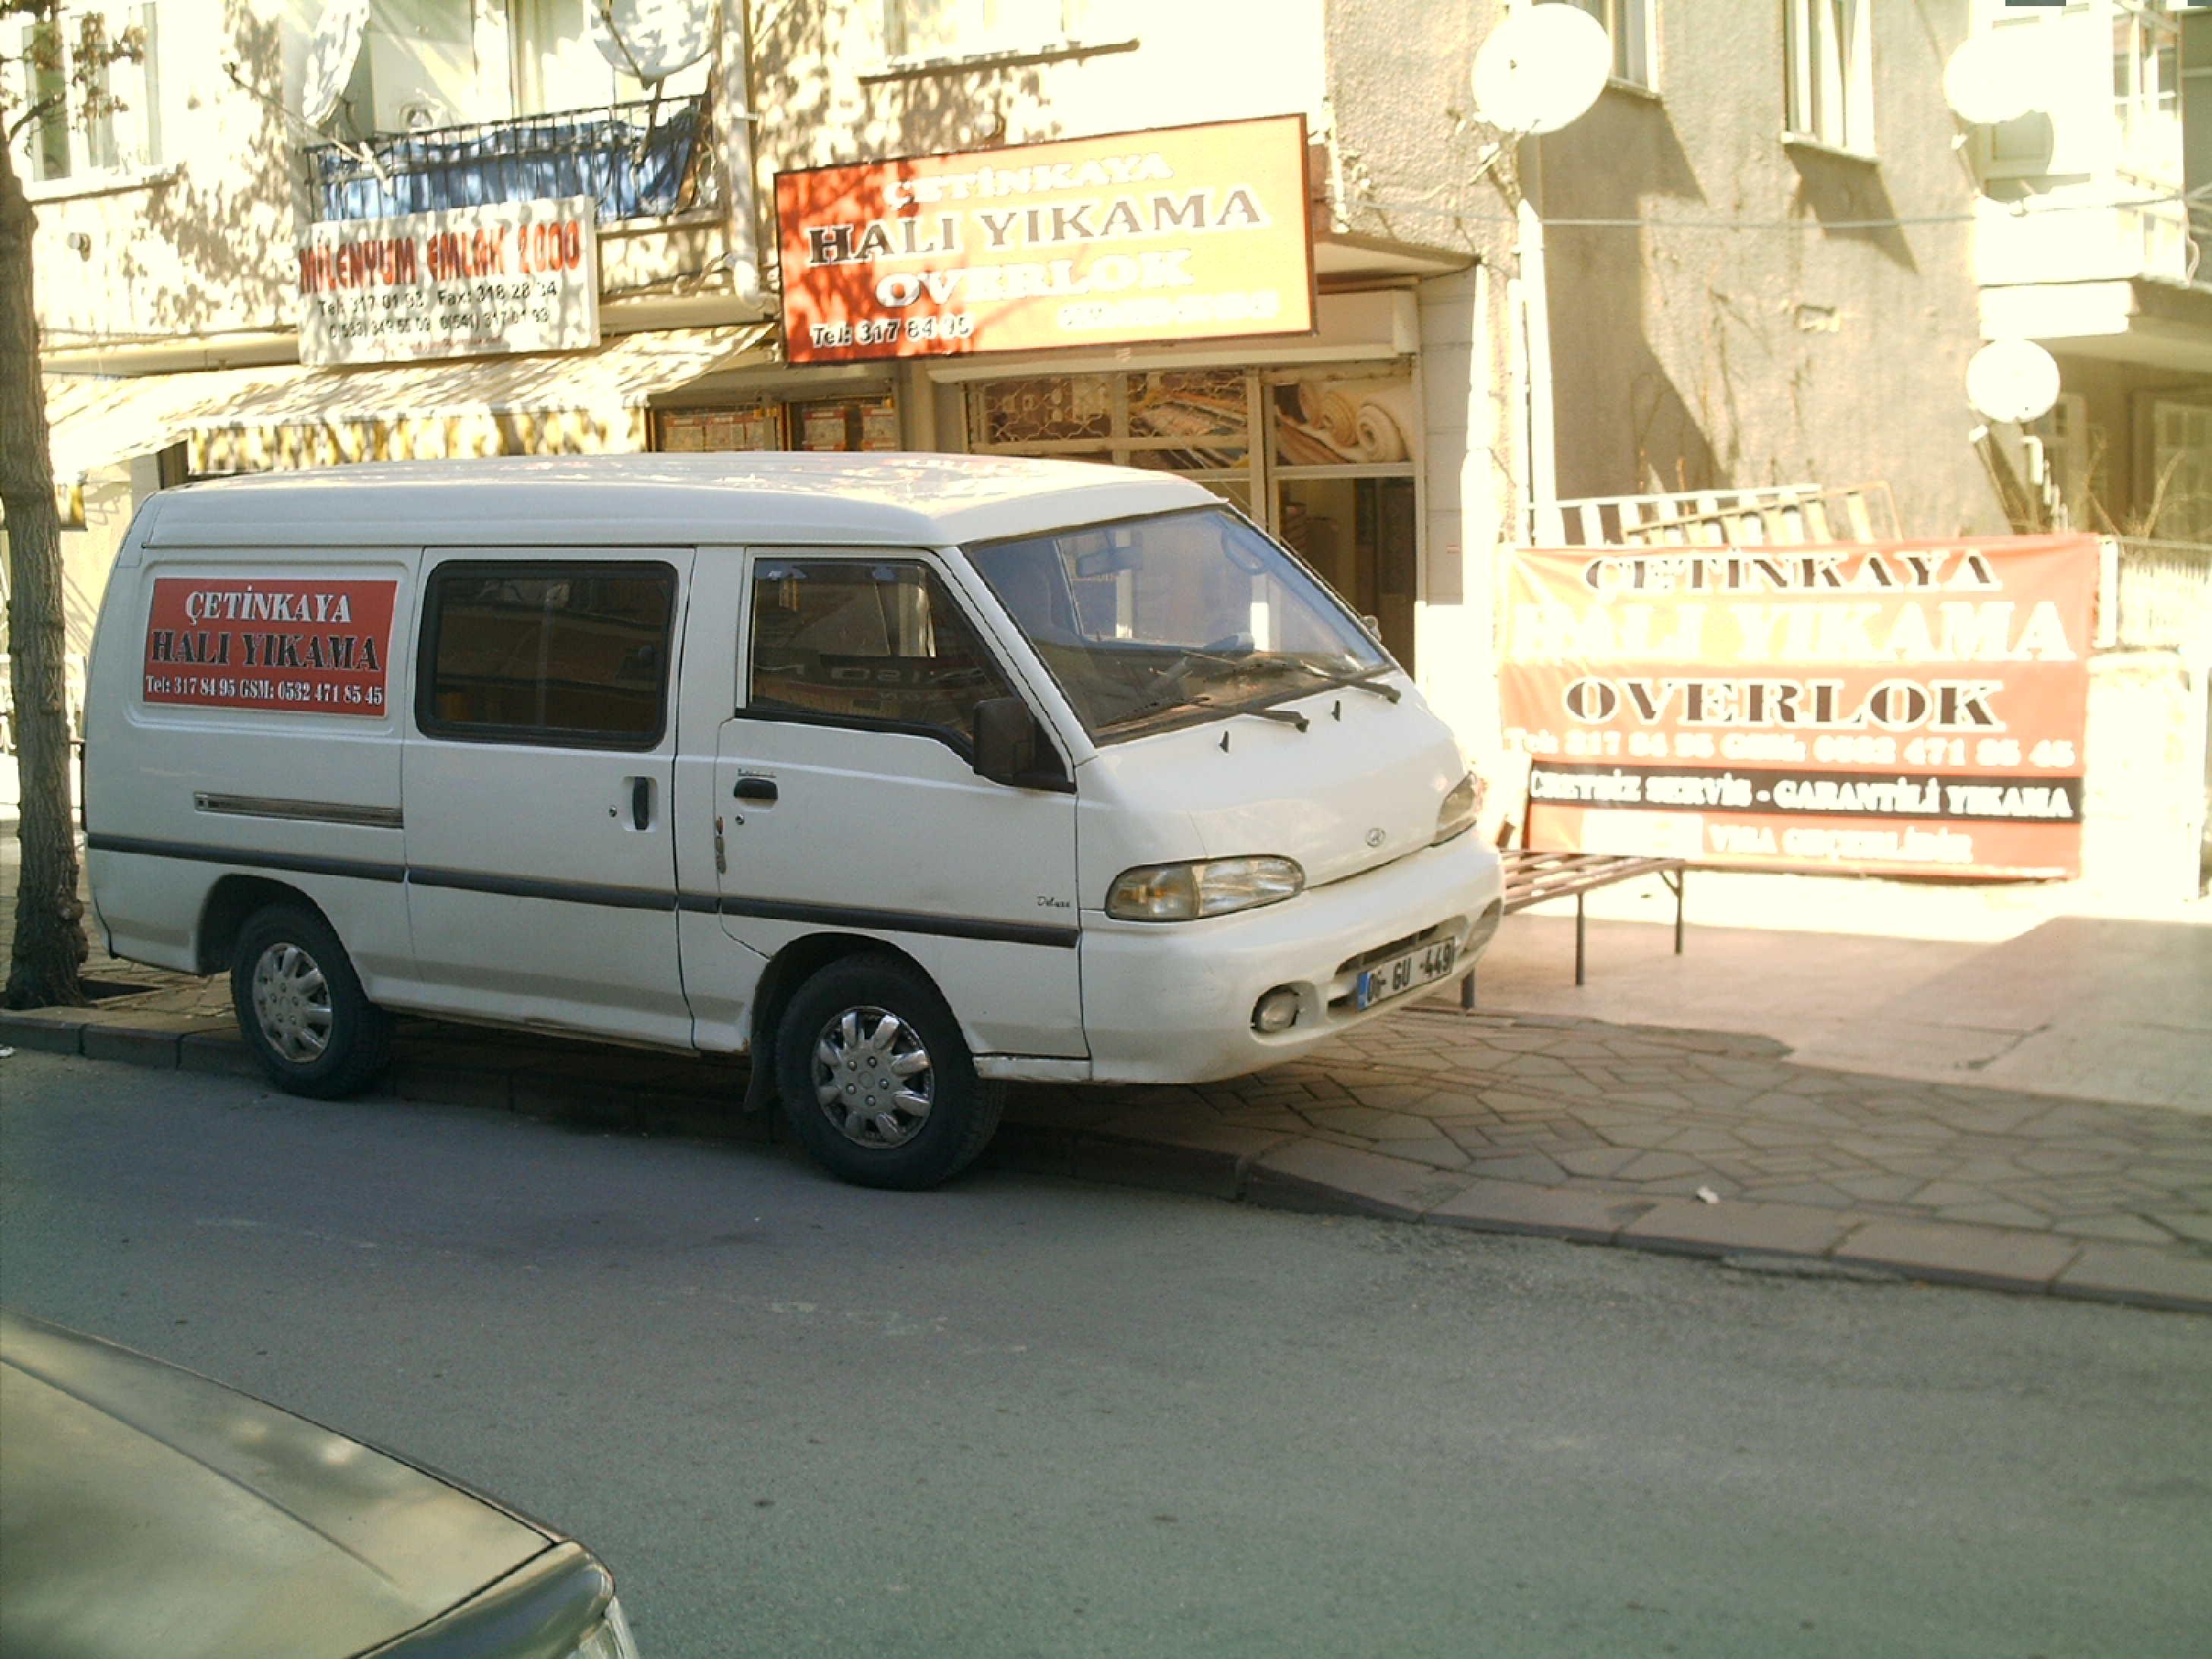 baglarbasi_hali_yikama_servis